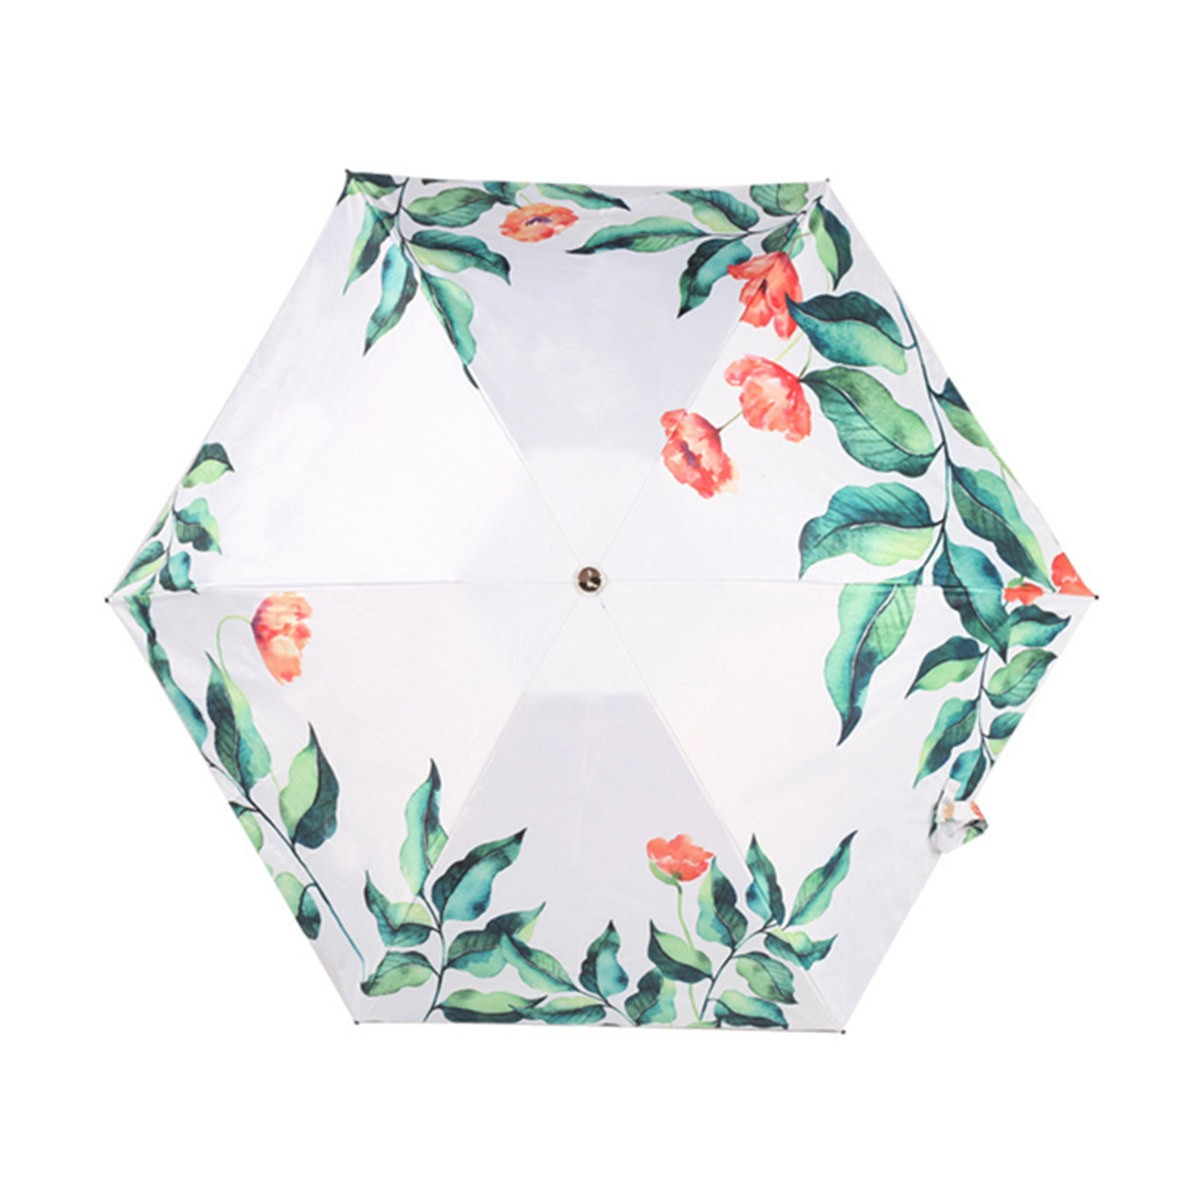 TIMESWOOD 超轻小巧黑胶防紫外线五折迷你口袋伞太阳伞晴雨伞  1把